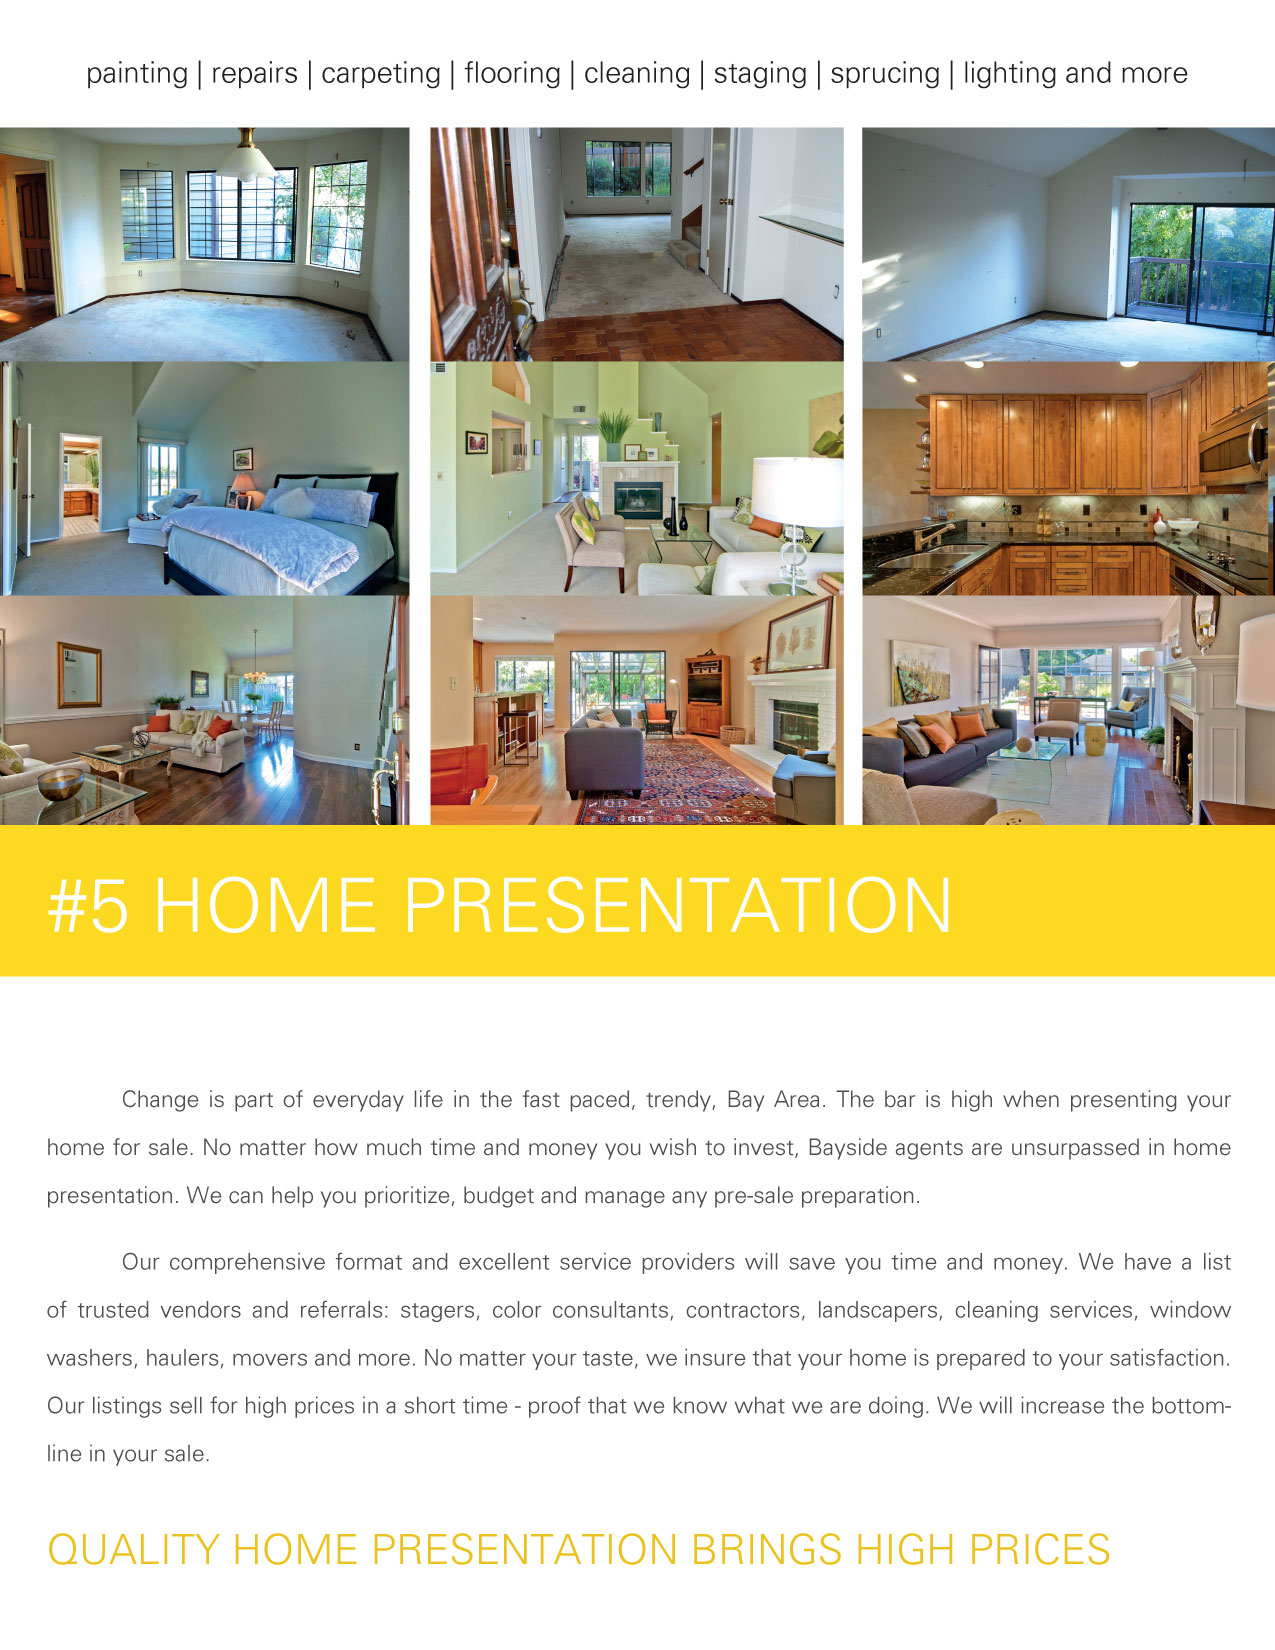 Listing Presentation - #5 Home Presentation